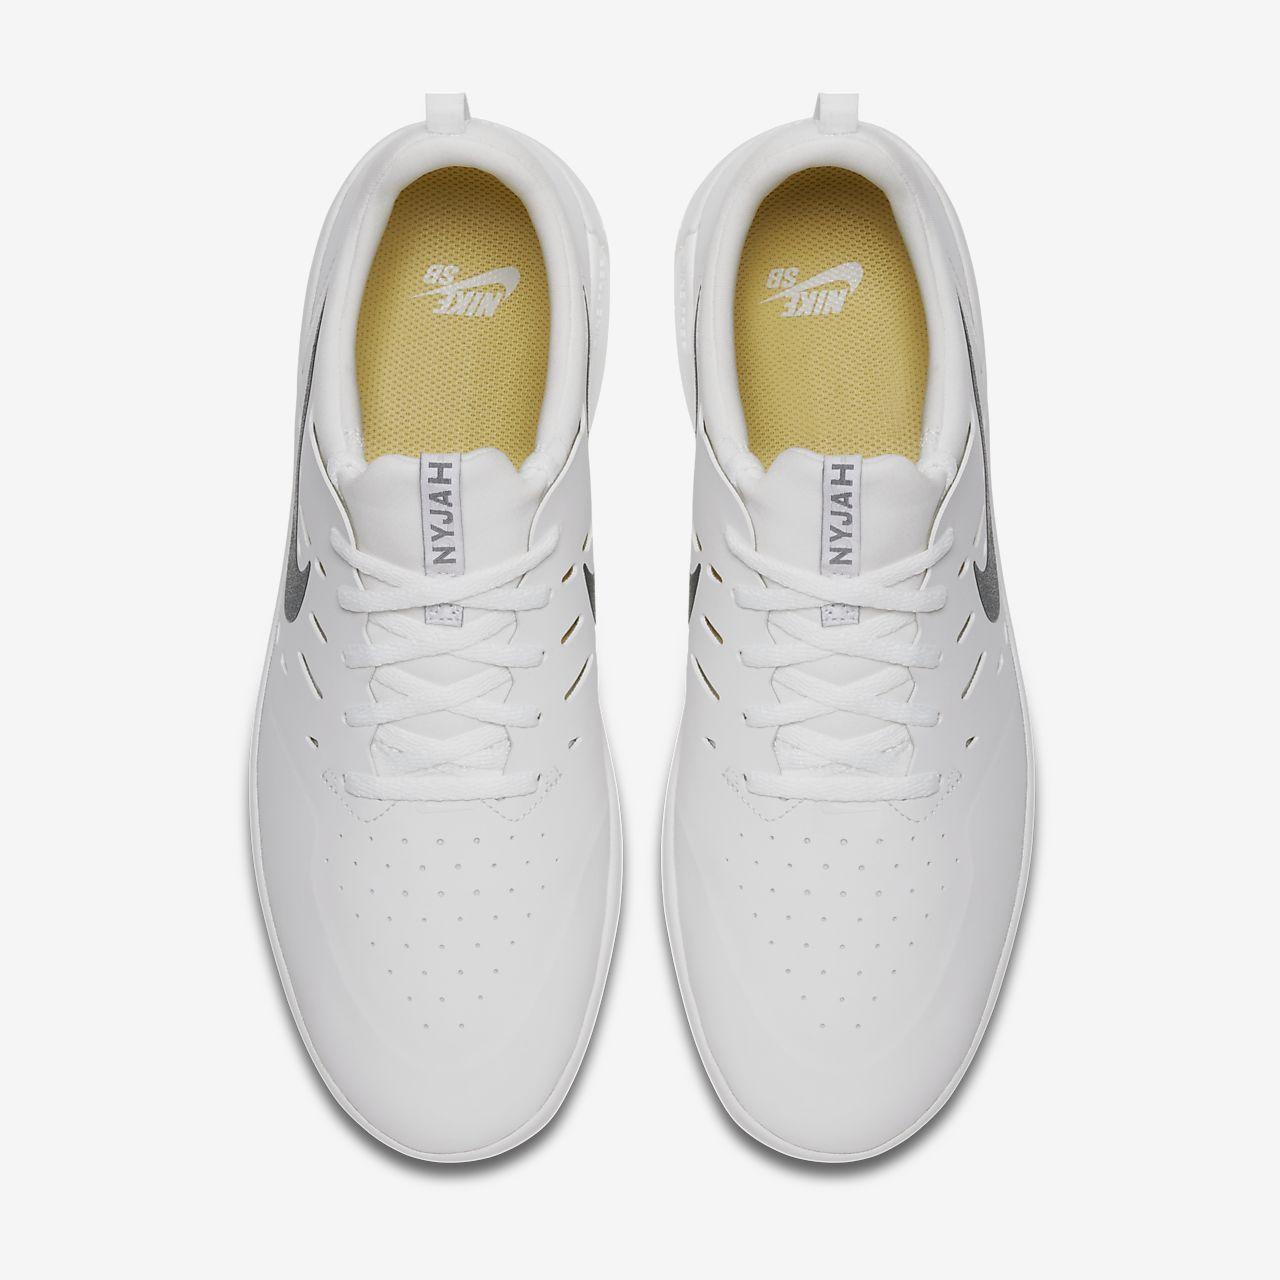 c293211dbfa3 Nike SB Nyjah Free Skate Shoe. Nike.com